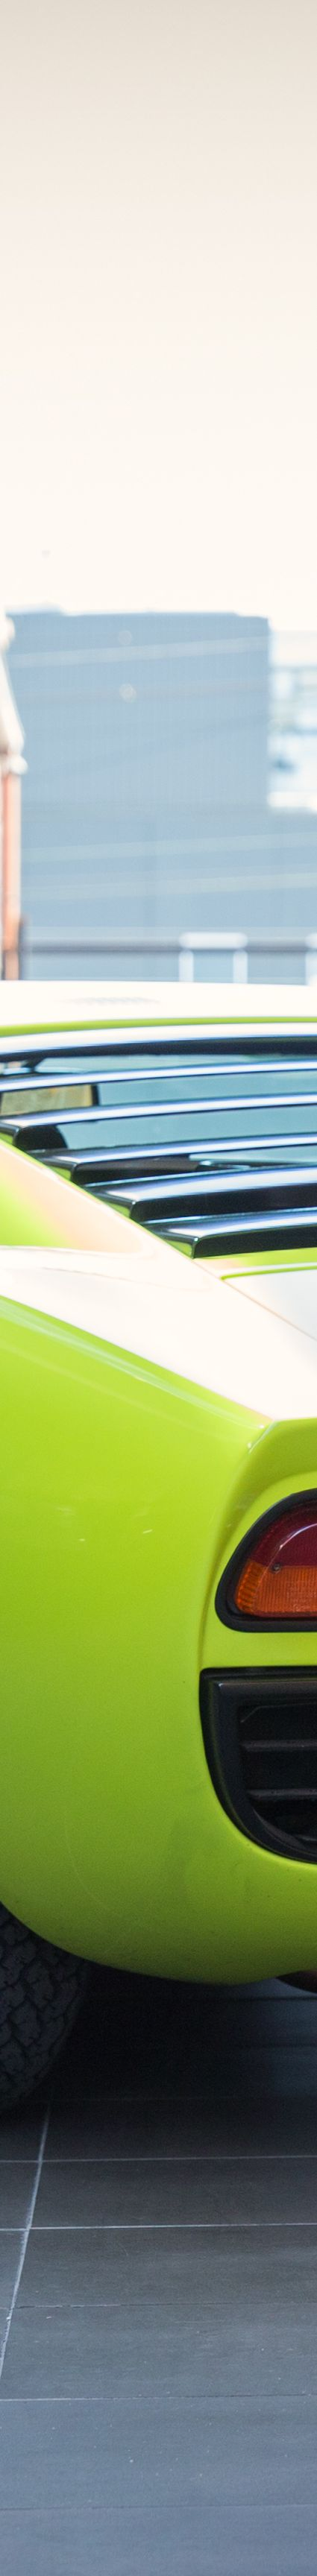 1969 Lamborghini Miura Classic Car for Sale